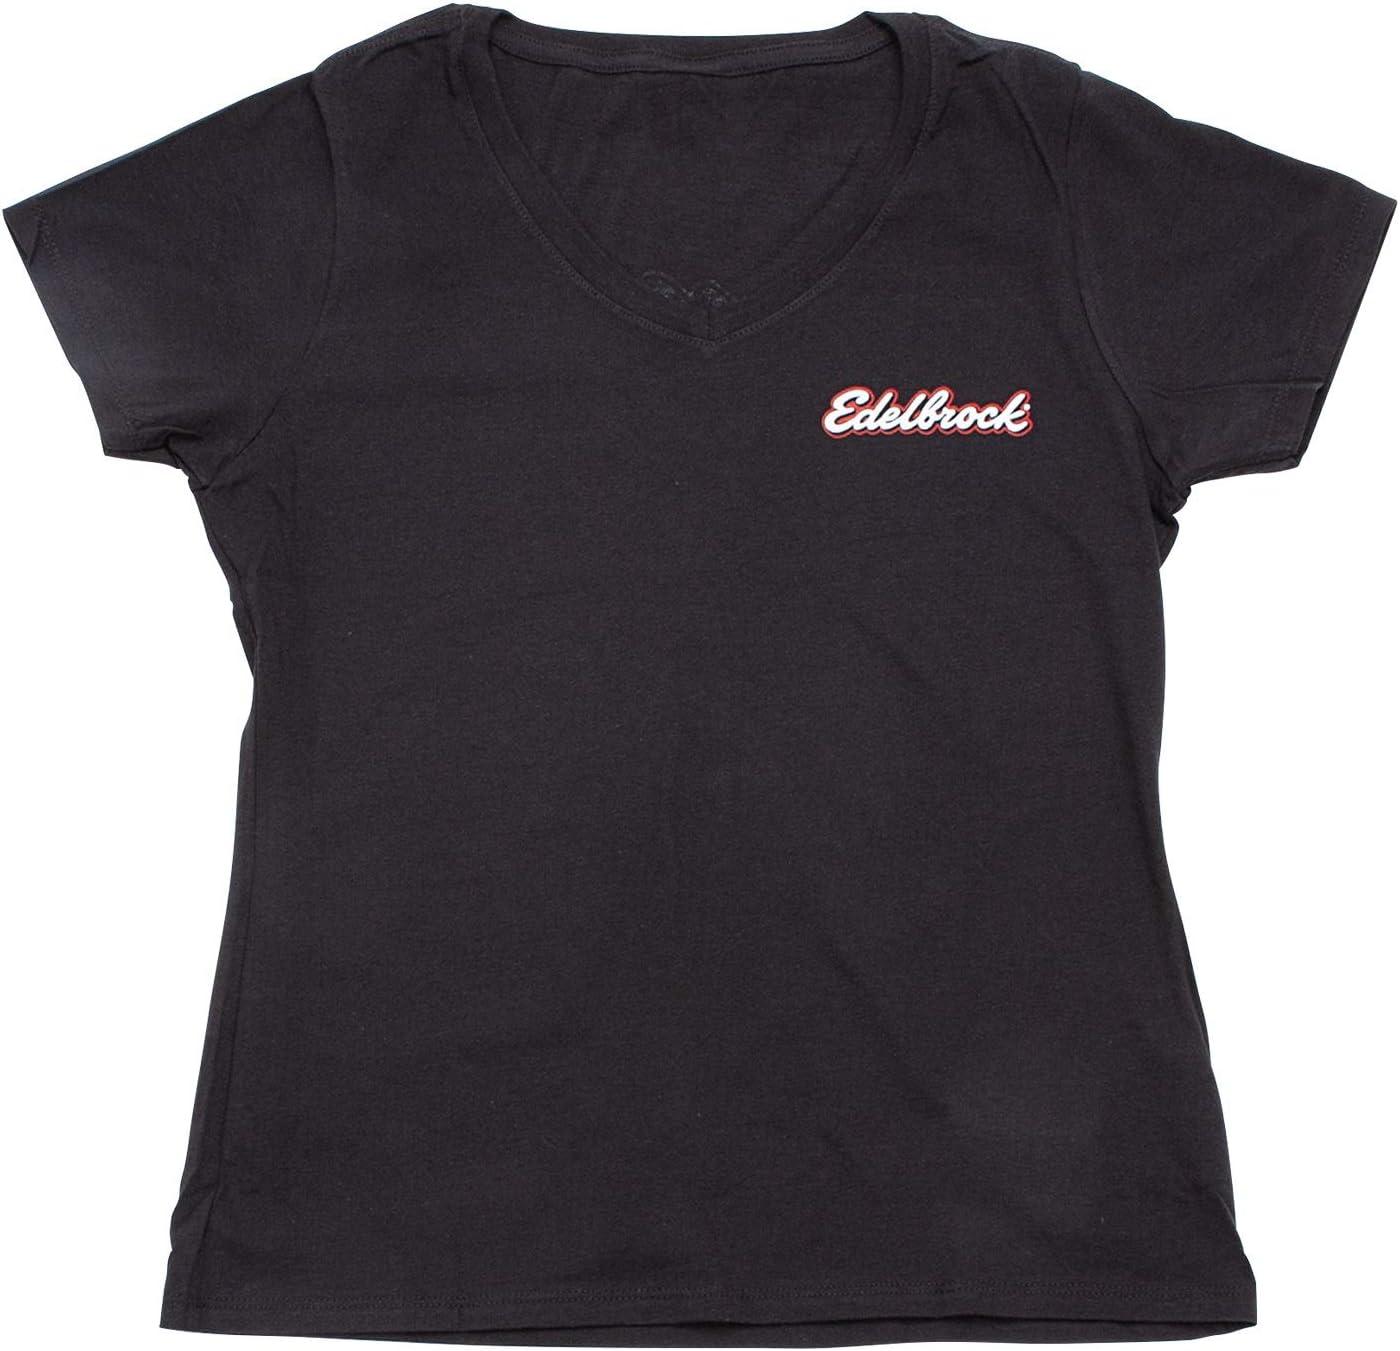 Edelbrock 389378 Black Small LADIES T-SHIRT